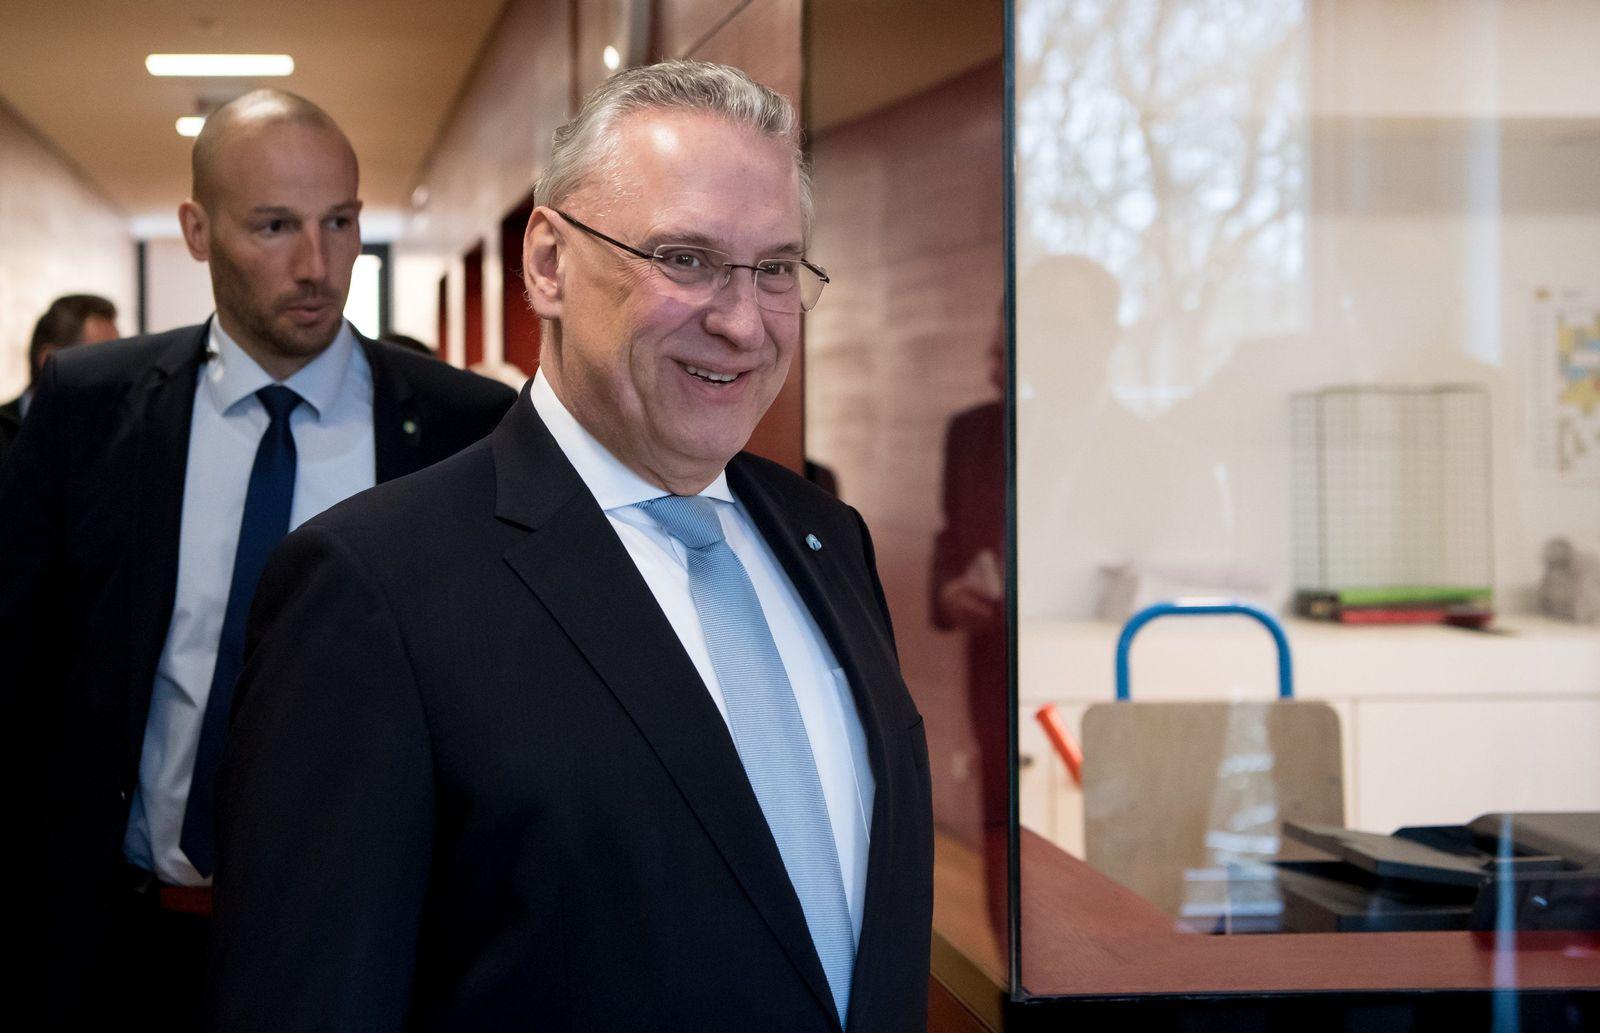 CSU/ Kabinett/ Joachim Herrmann